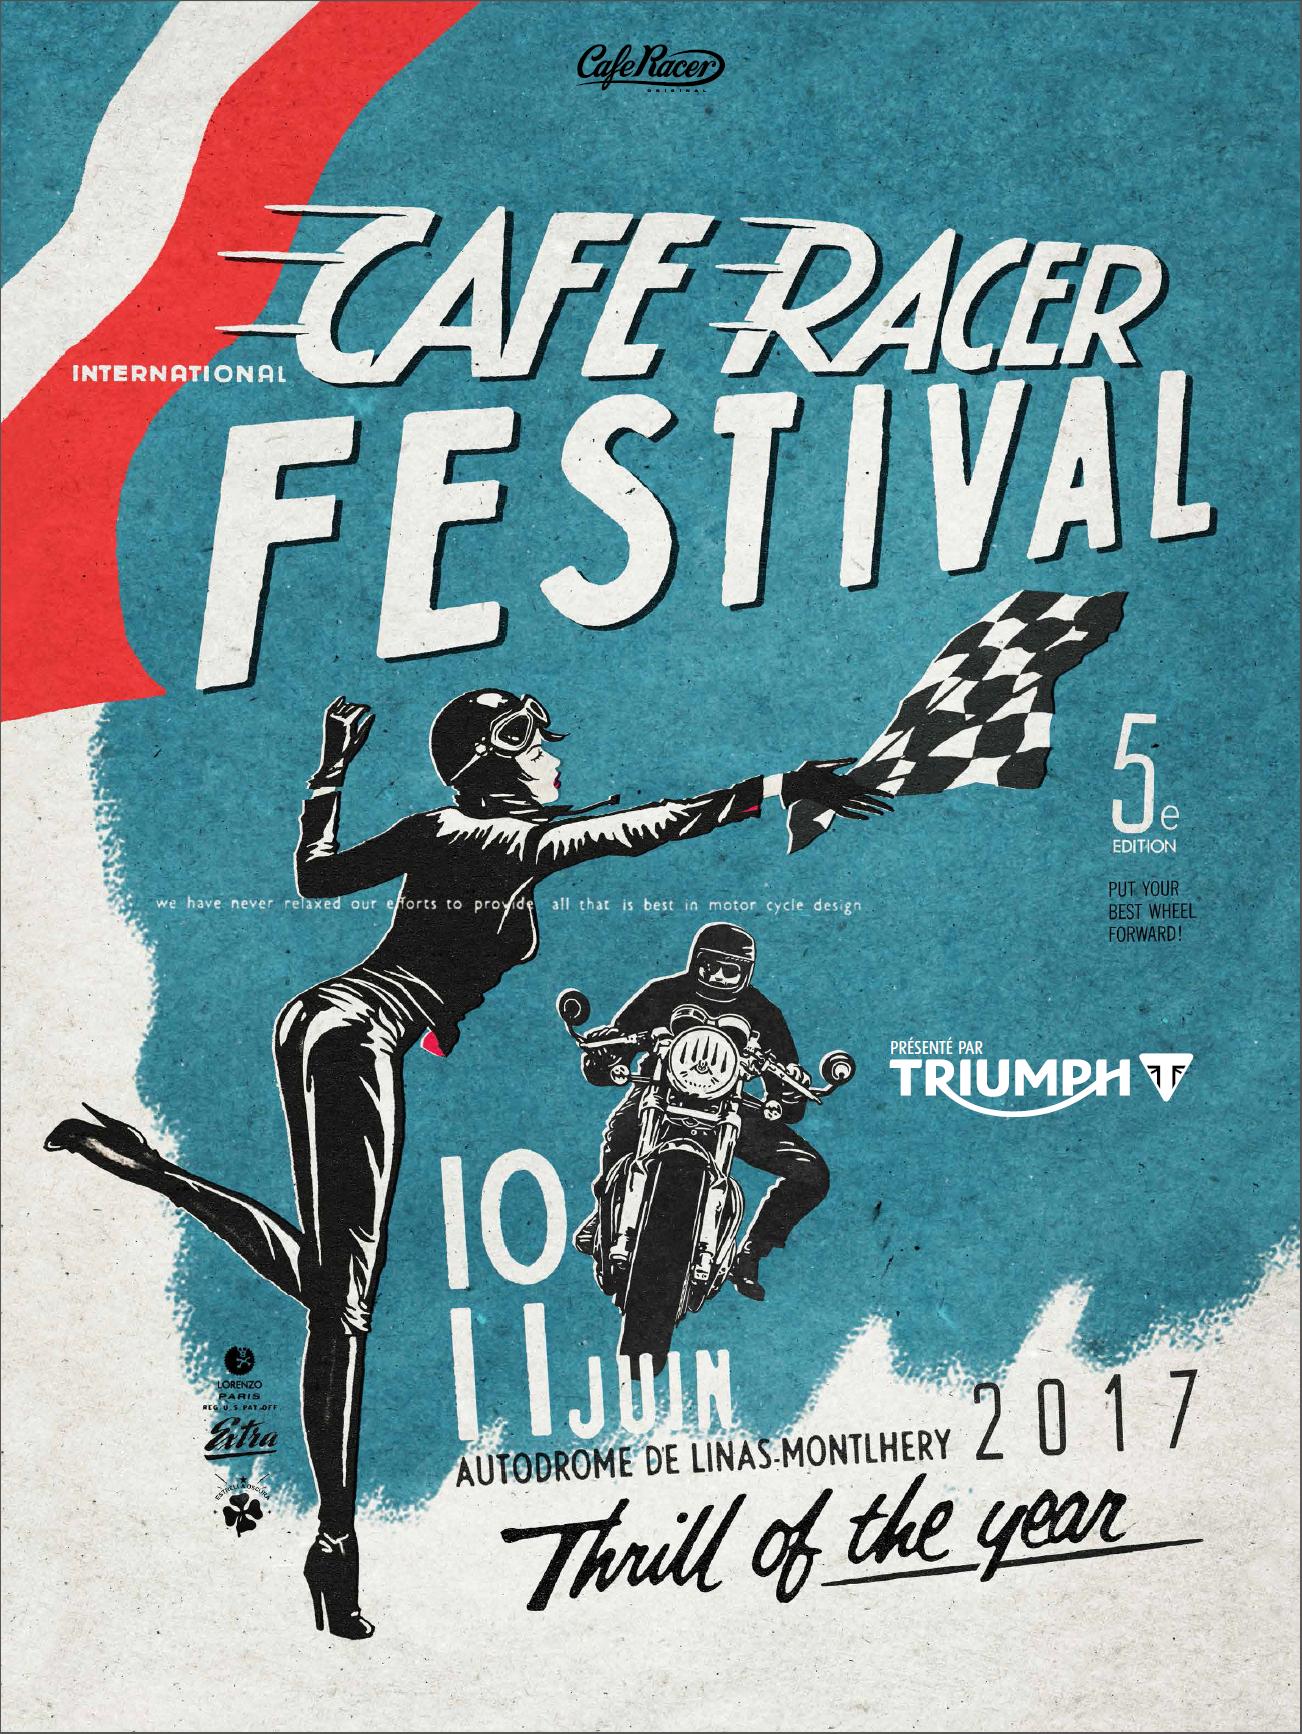 Cafe Racer Festival  Inscription